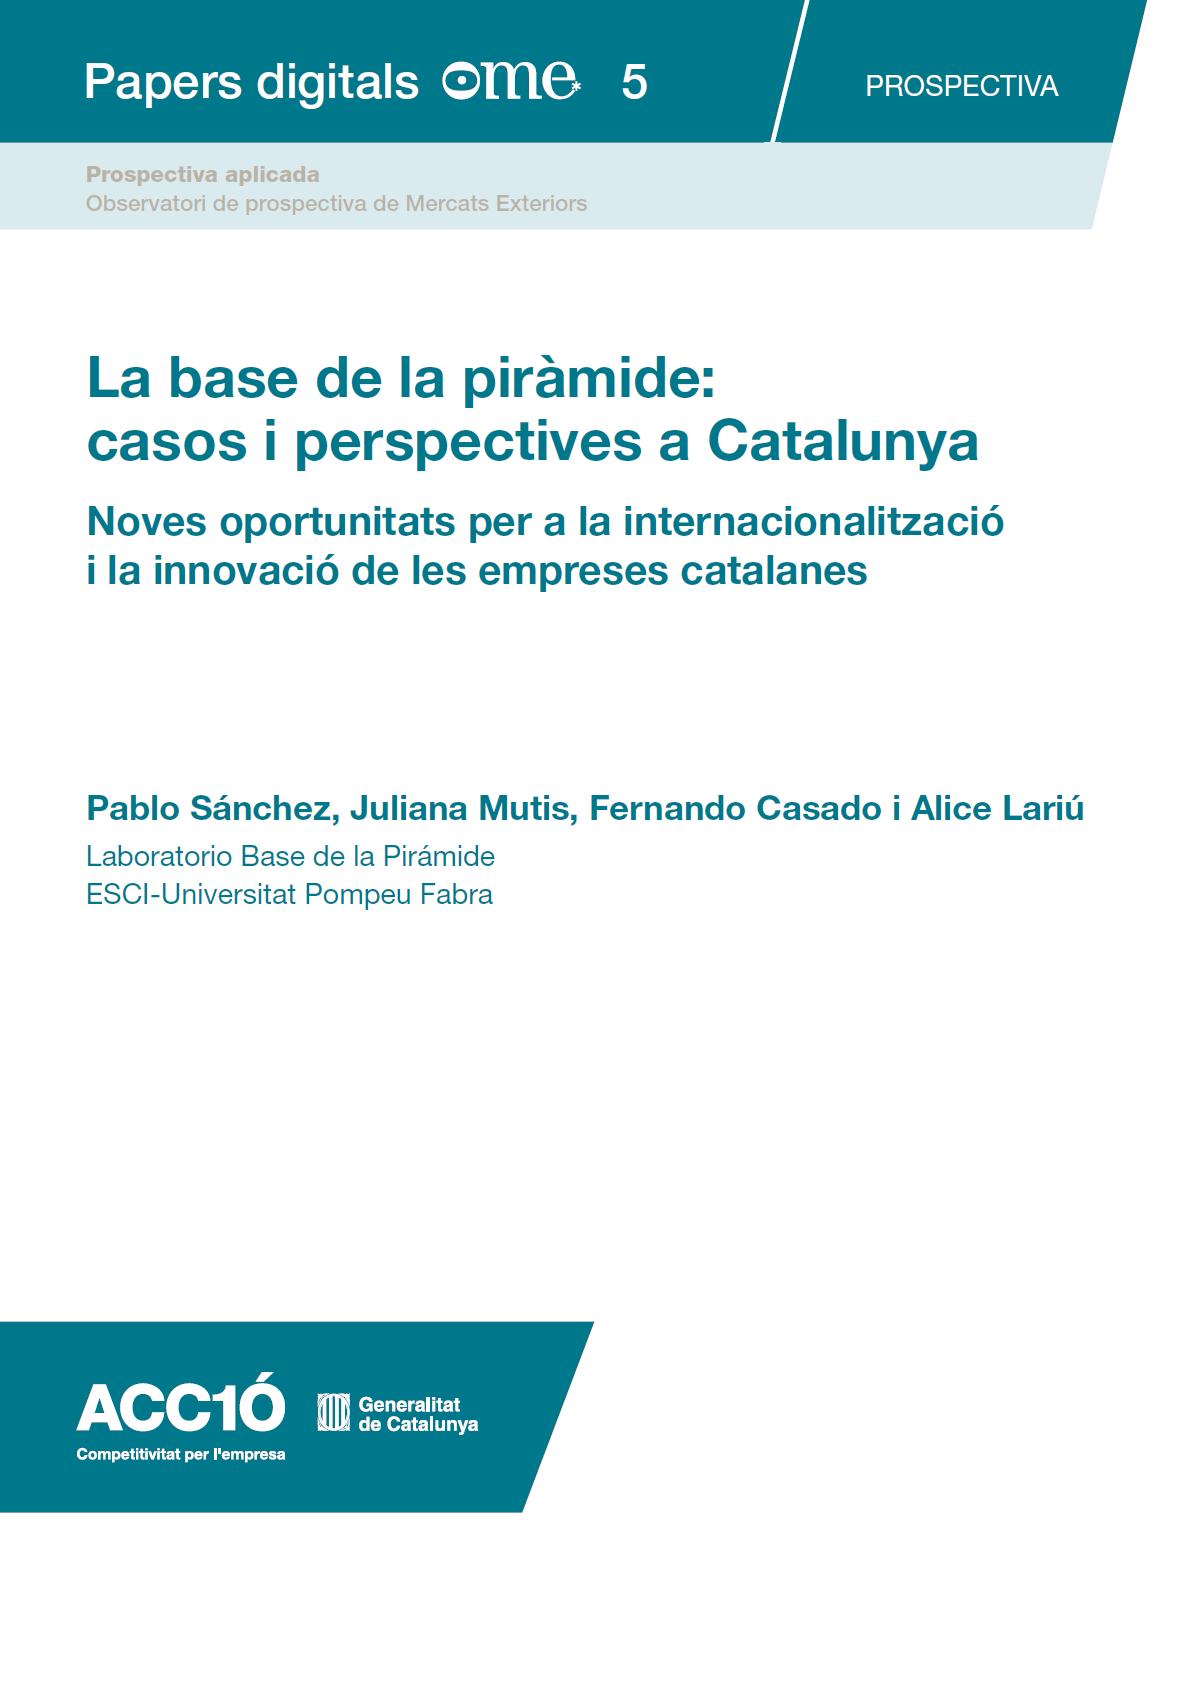 The Base of the Pyramid: Perspectives in Cases i Catalunya. Ed ACC1Ó, Generalitat de Catalunya, Barcelona